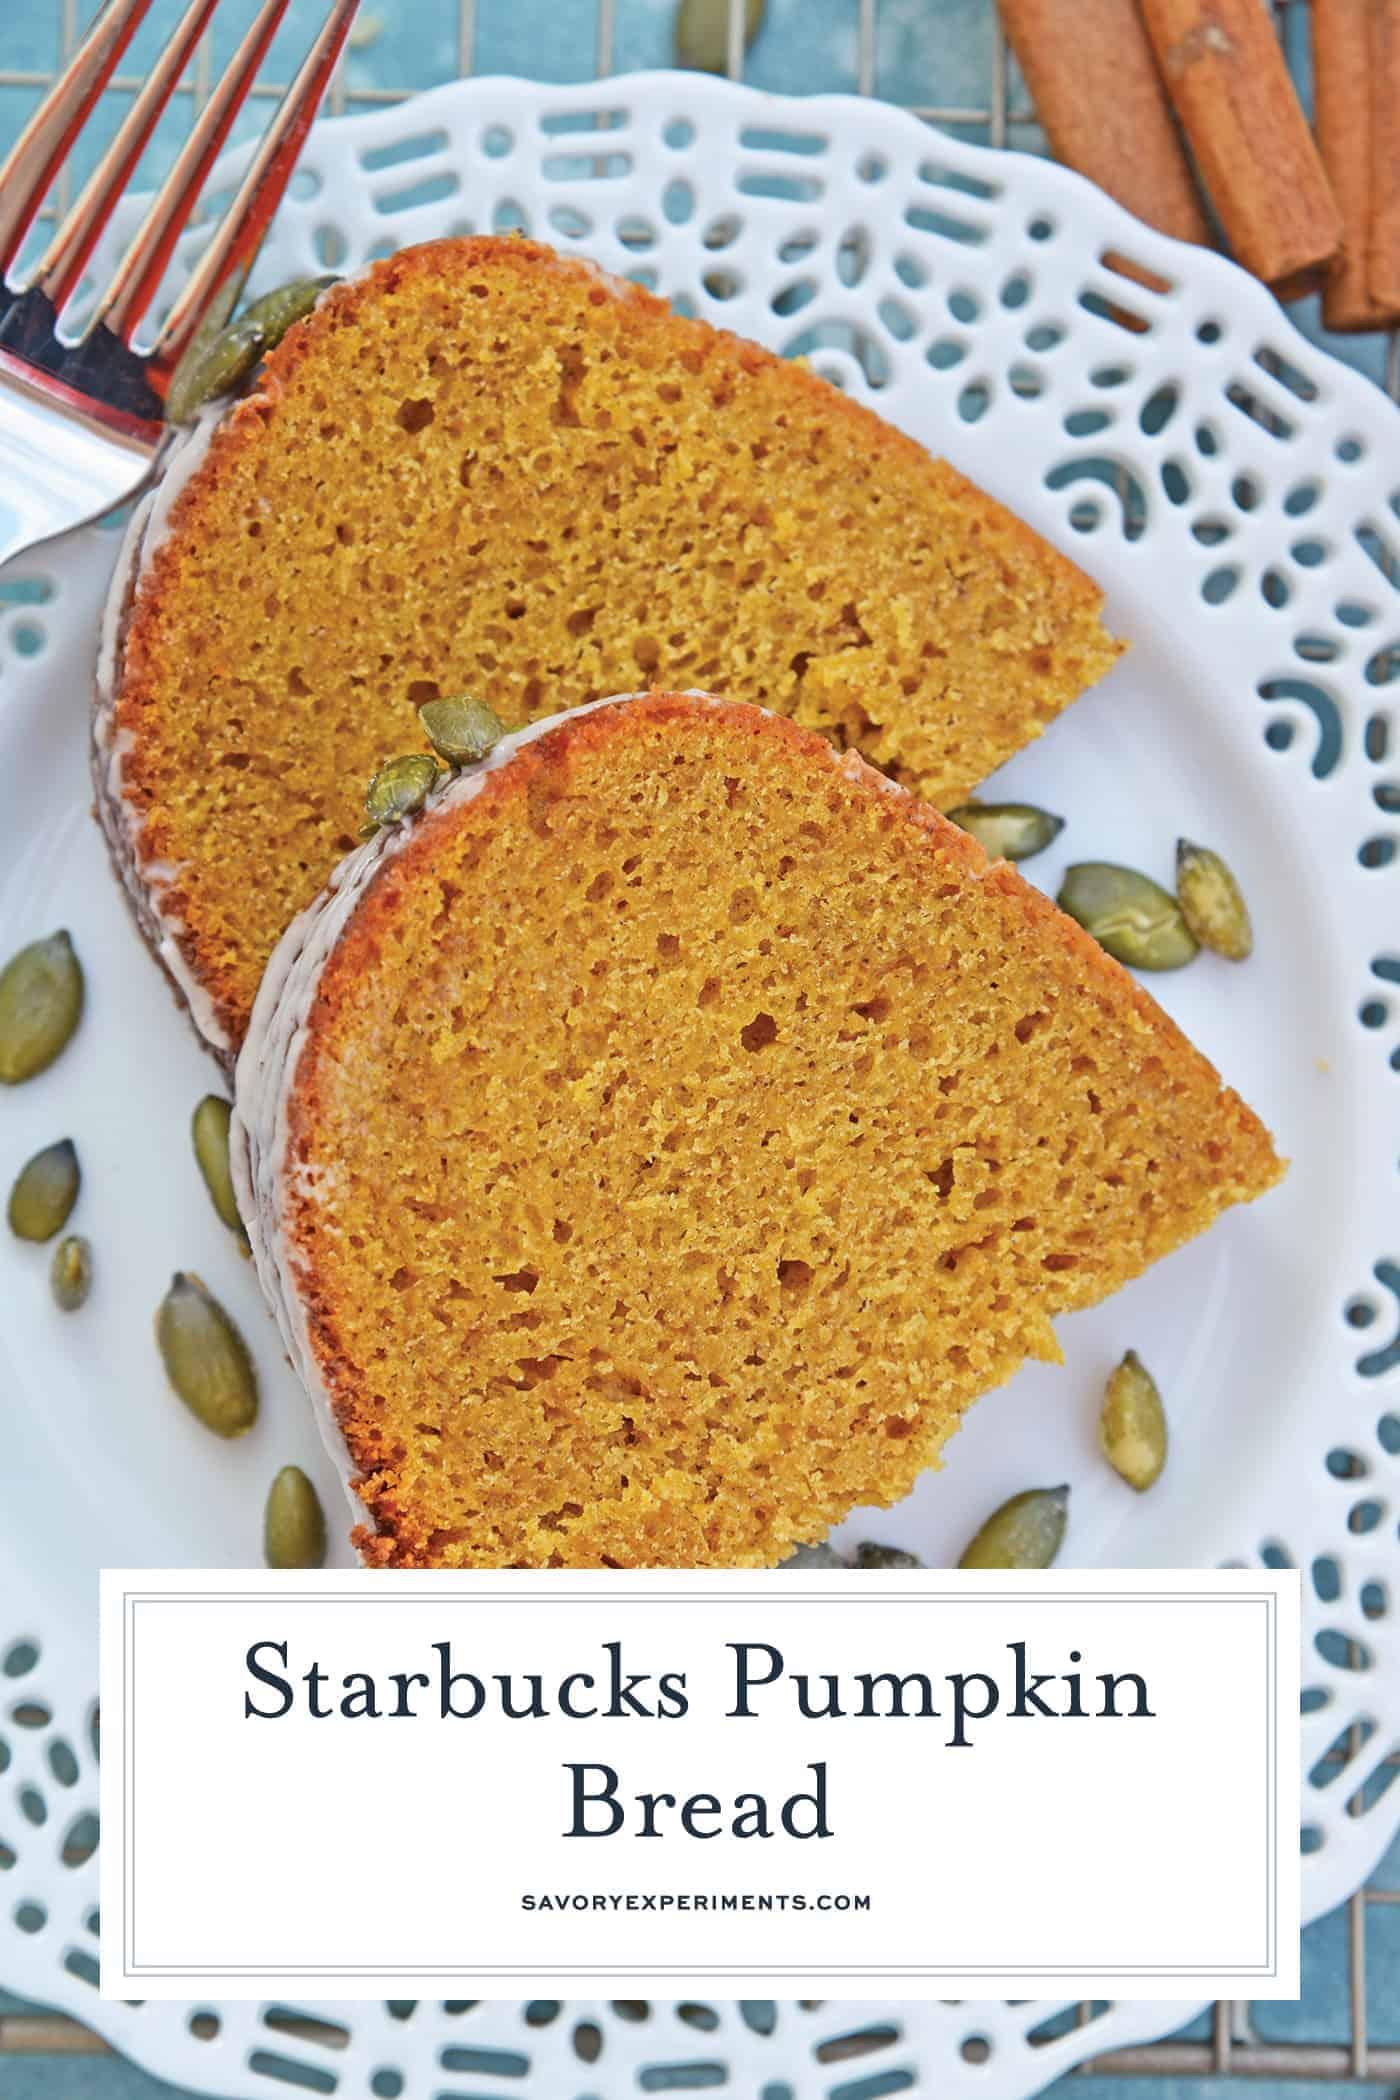 Copycat Starbucks Pumpkin Bread is a moist and flavorful pumpkin pound cake perfect for pairing with a pumpkin spice coffee! #pumpkinbread #pumpkinpoundcake www.savoryexperiments.com